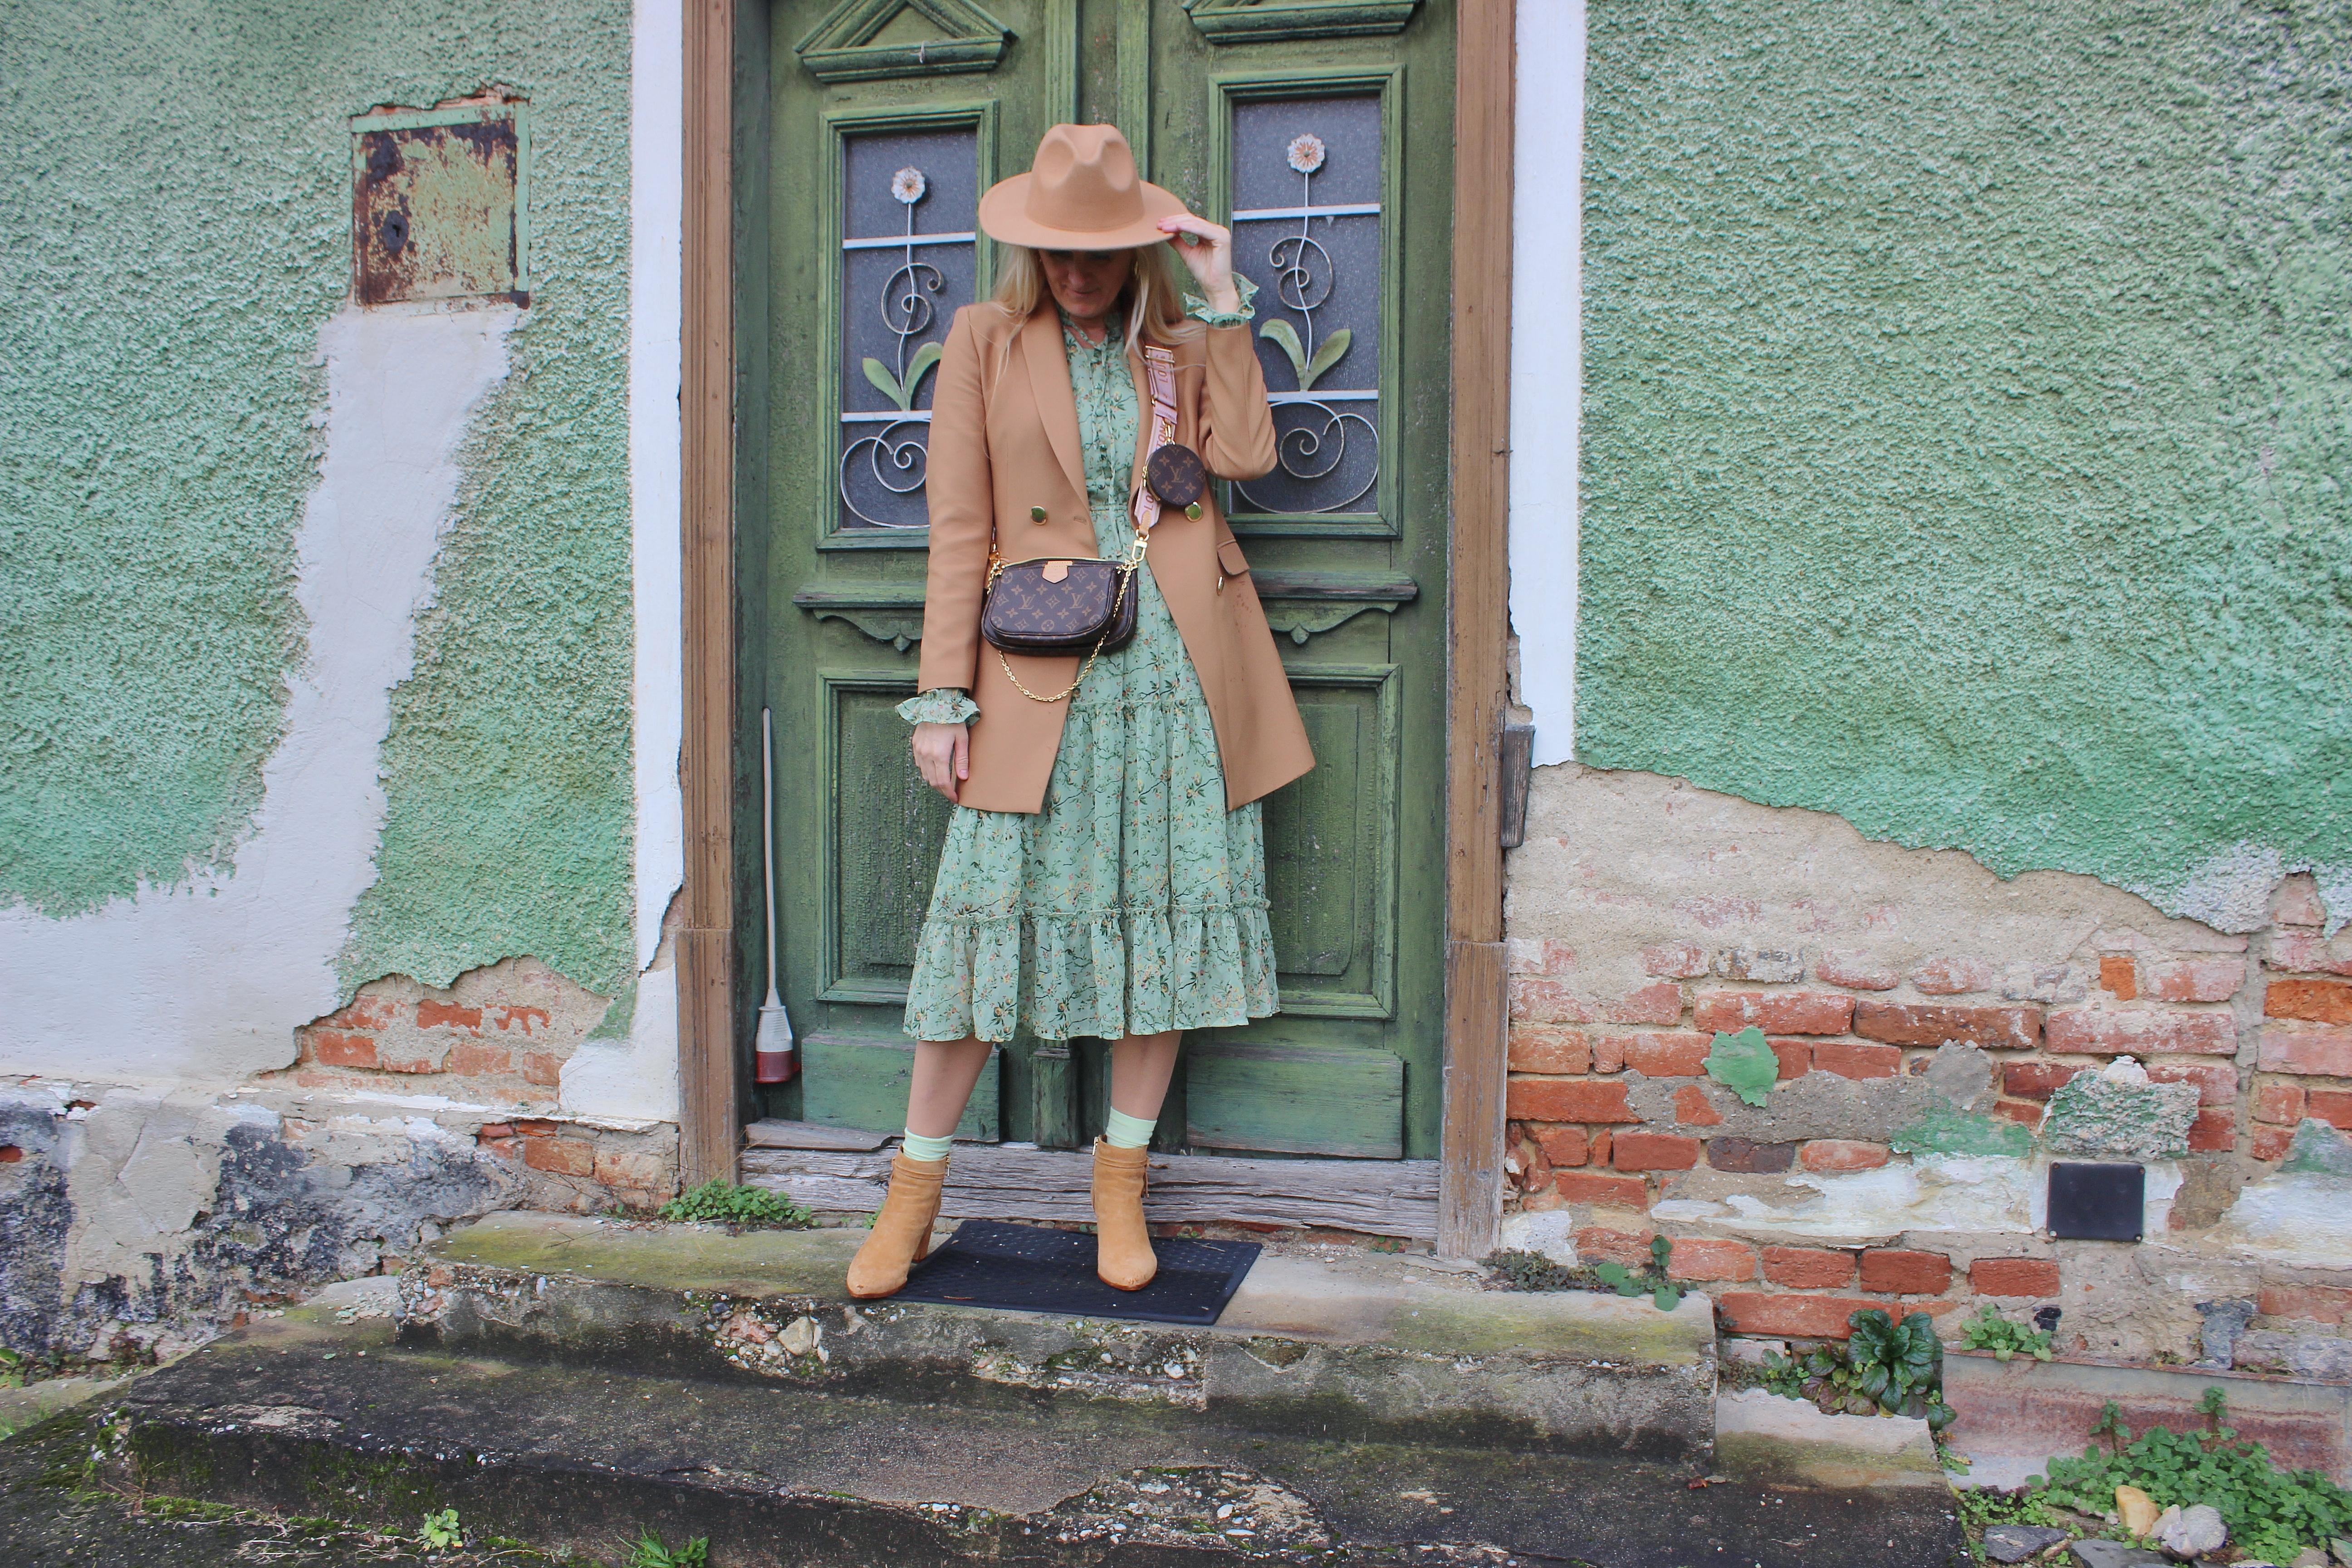 Grünes Midi Blumenprintkleid Nakd Fashion-Cognac Farbige Boots CCC Shoes and Bags-Lasocki Boots-Cognac Blazer-Louis Vuitton Bag-carrieslifestyle-Tamara Prutsch